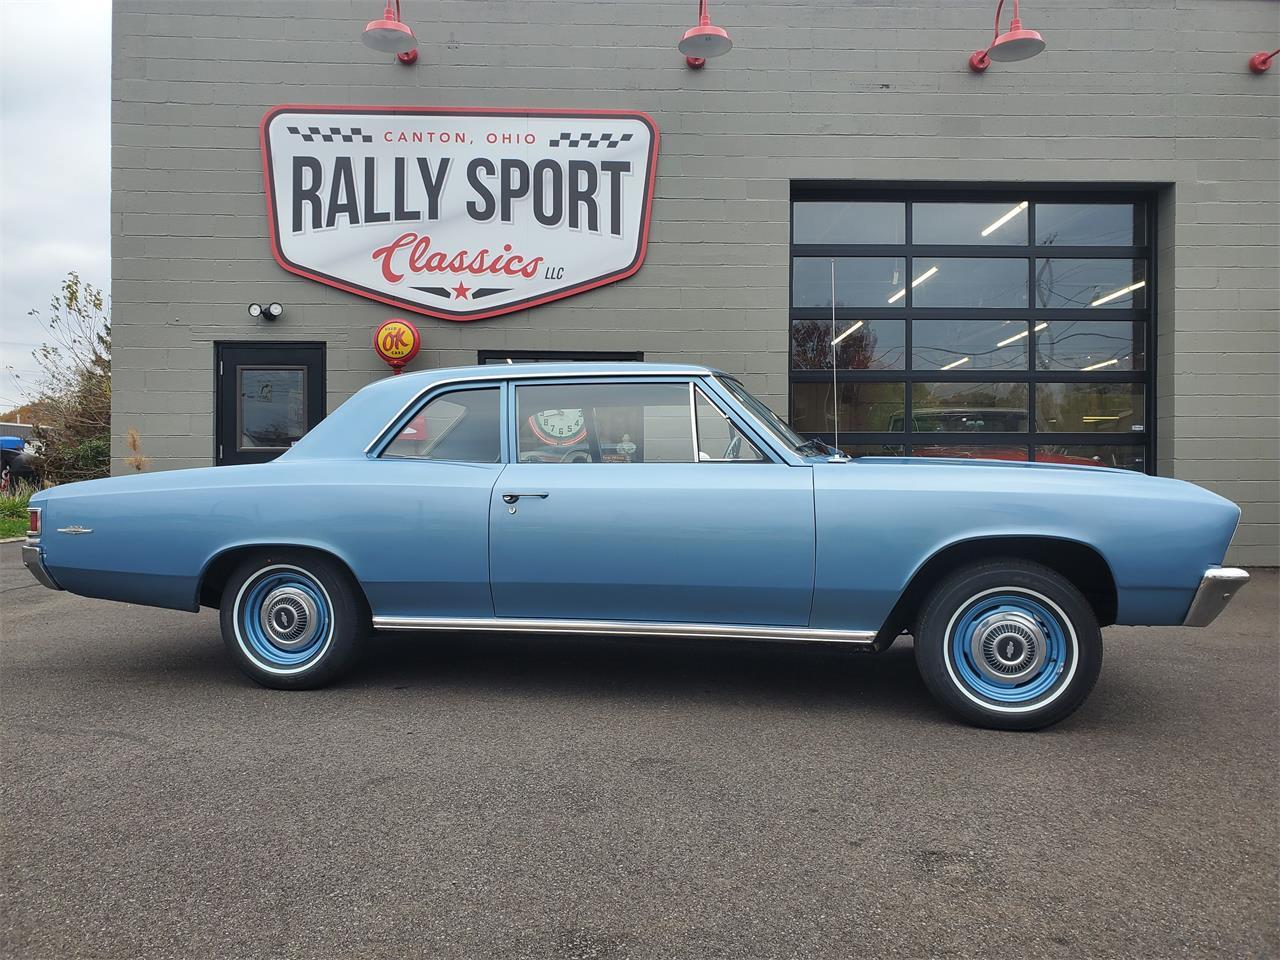 1967 Chevrolet Chevelle 300 Deluxe (CC-1295242) for sale in Canton, Ohio